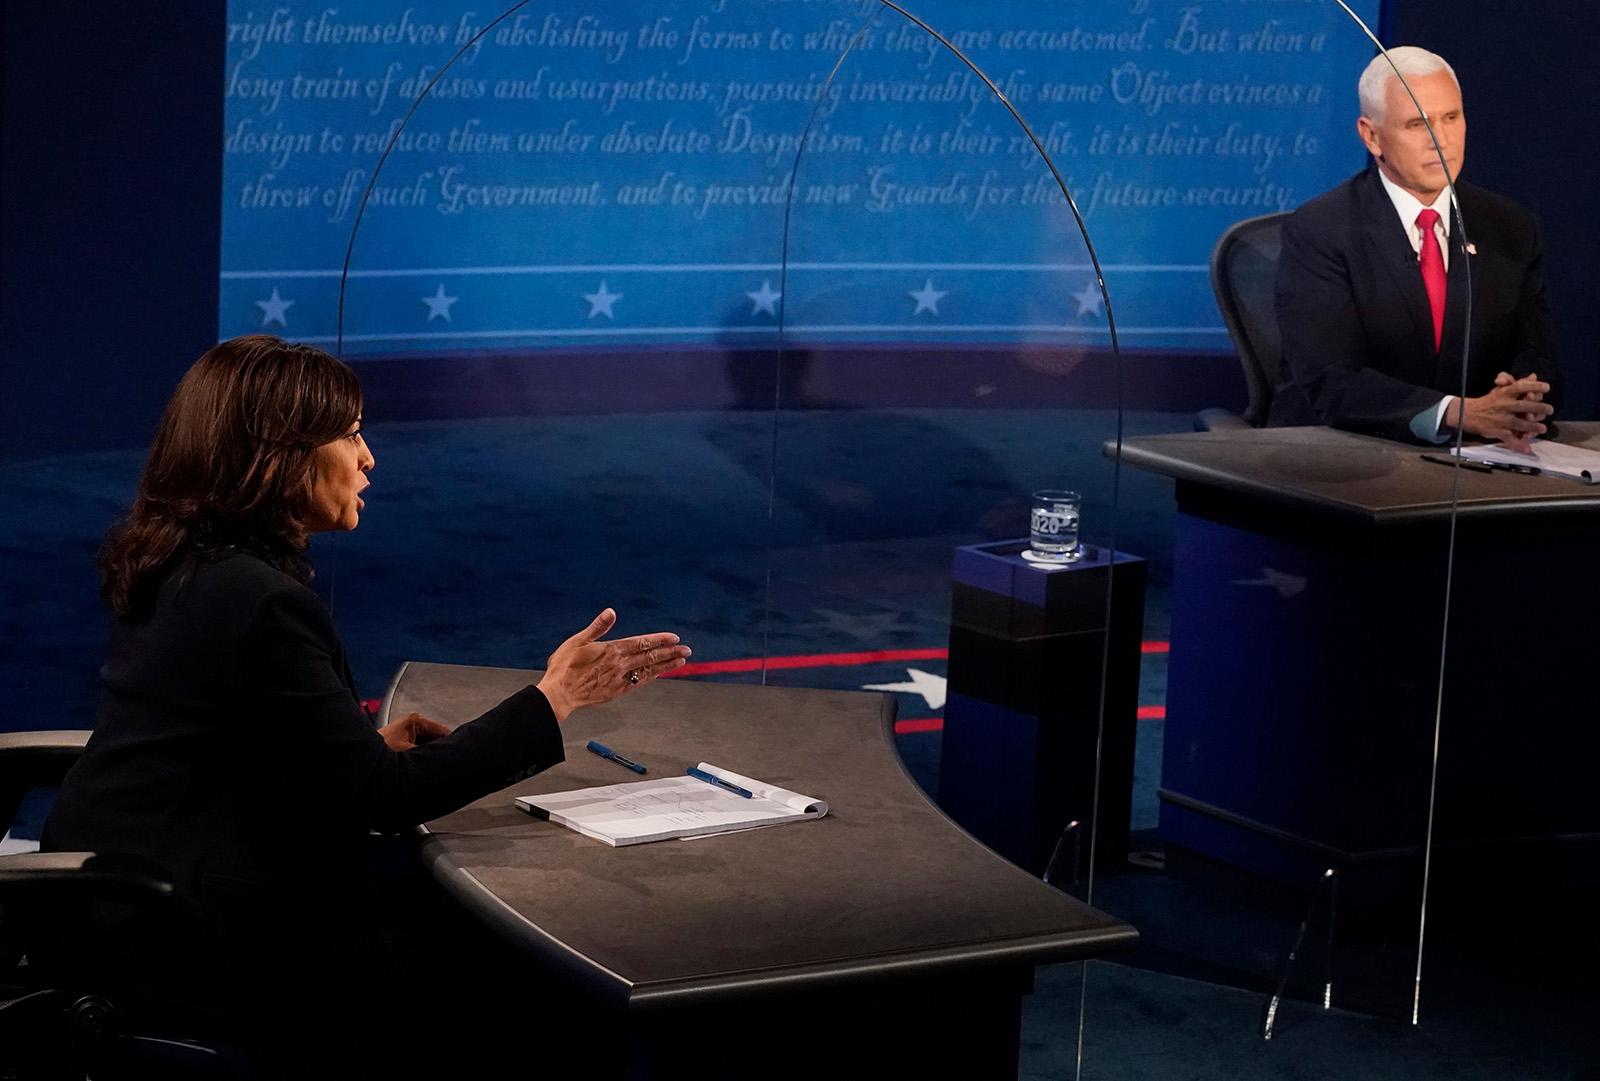 Vice President Mike Pence listens as Democratic vice presidential nominee Kamala Harris speaks during the vice presidential debate on Wednesday in Salt Lake City.